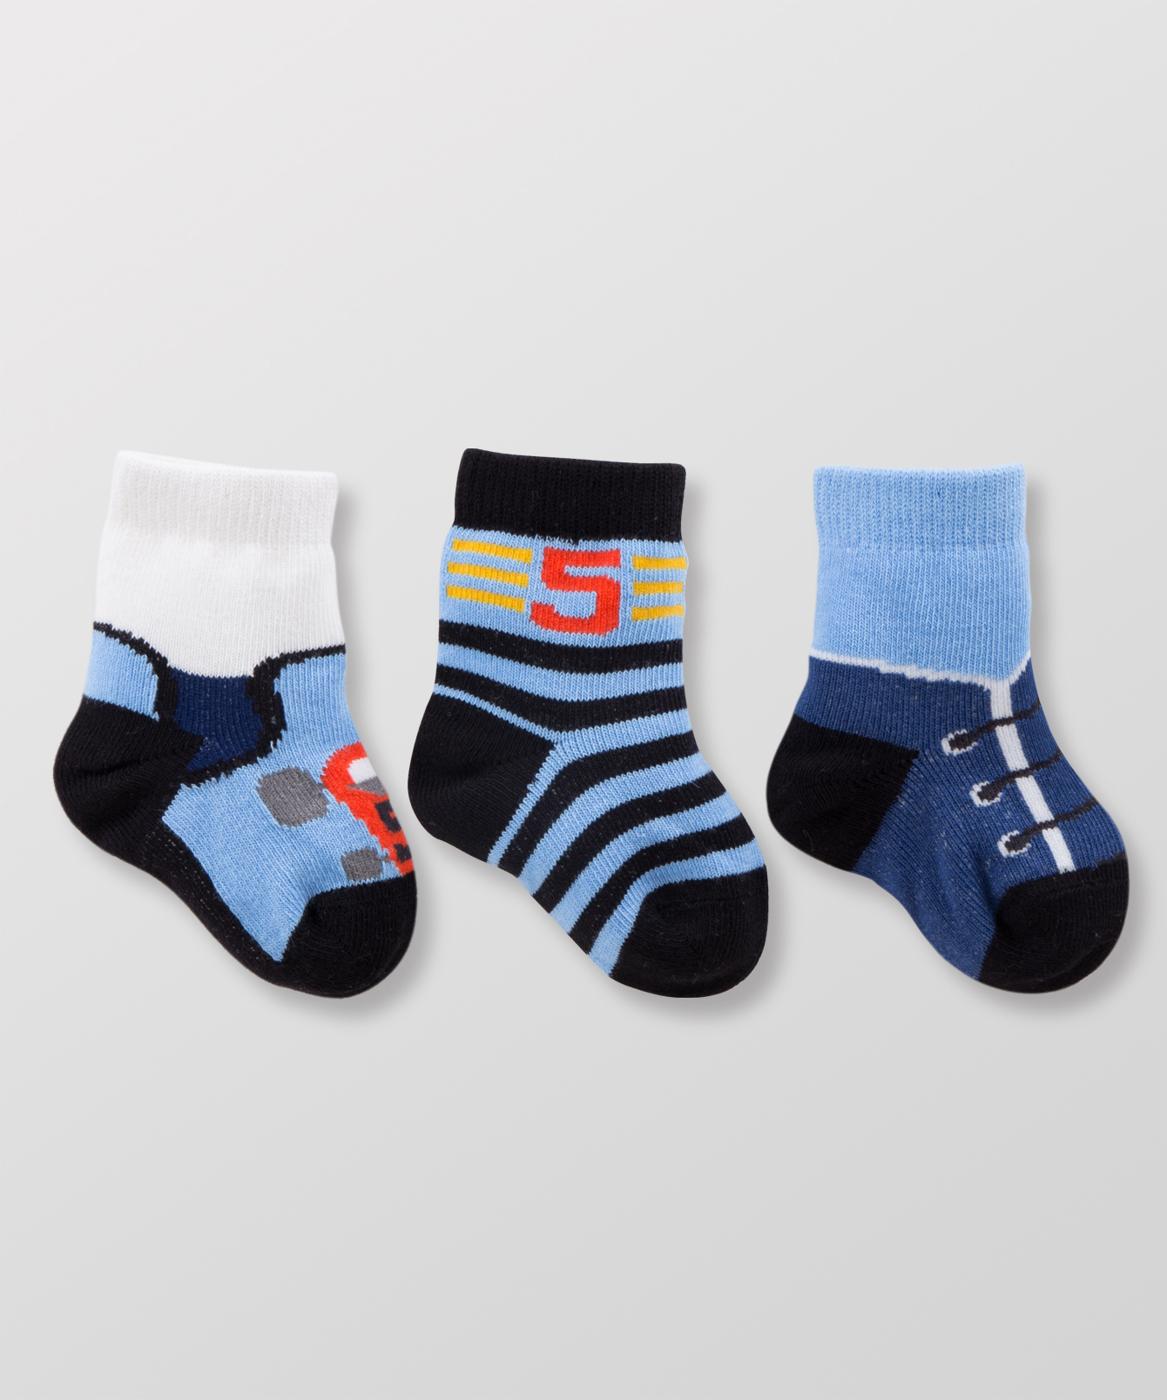 Hallmark Babies男嬰造型嬰兒襪三件裝HC3-B07-A1-AB-MB